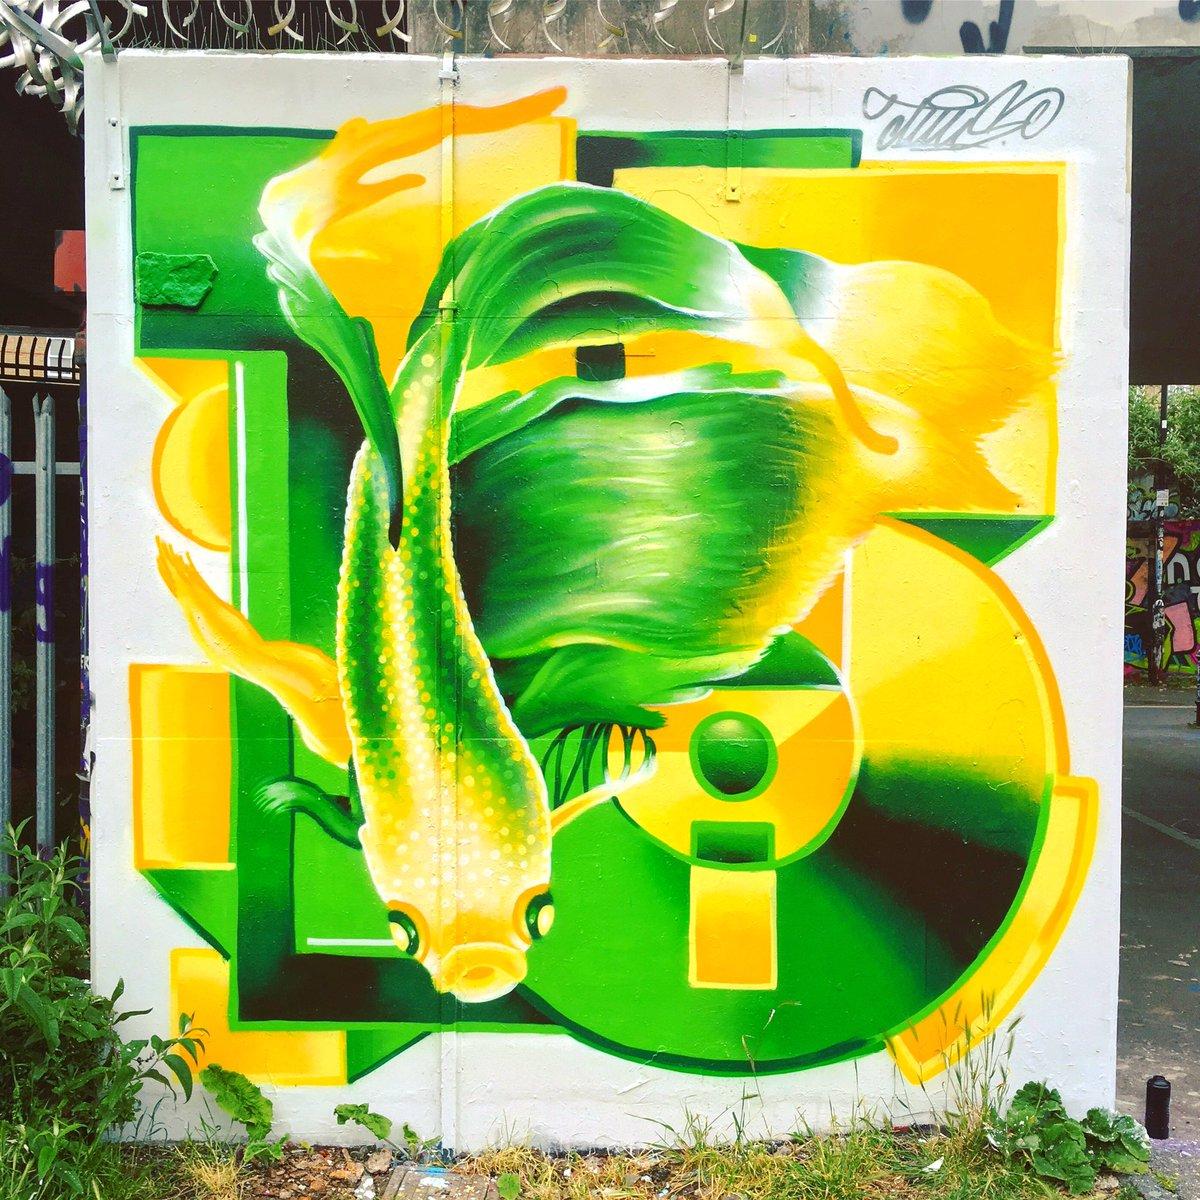 🎨 #tuis 🗺 Pedley Street, London E1 📆 May 2019 #bricklane #shoreditch #streetart #graffiti #goldfish #ldnstreetart https://t.co/YBaFu2vK4a